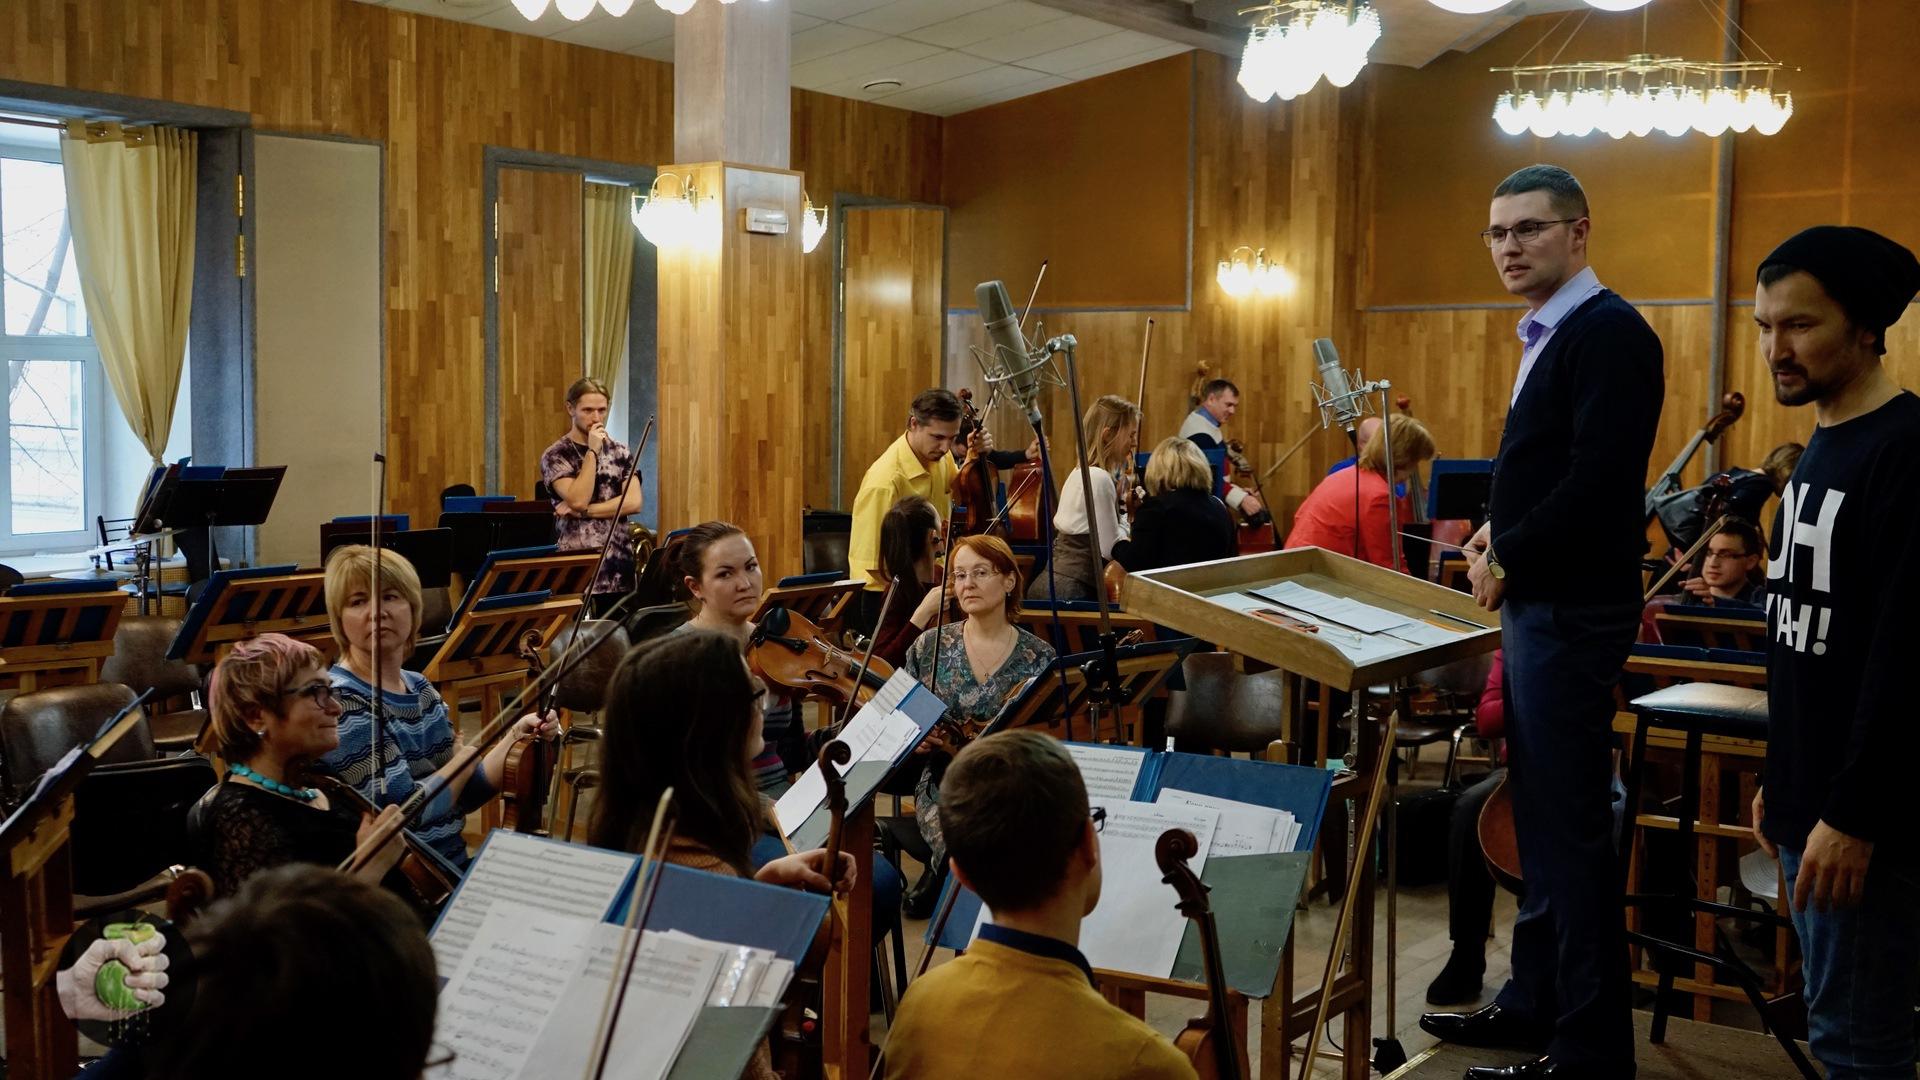 Ваня Чебанов, iMac Pro, оркестр, музыка